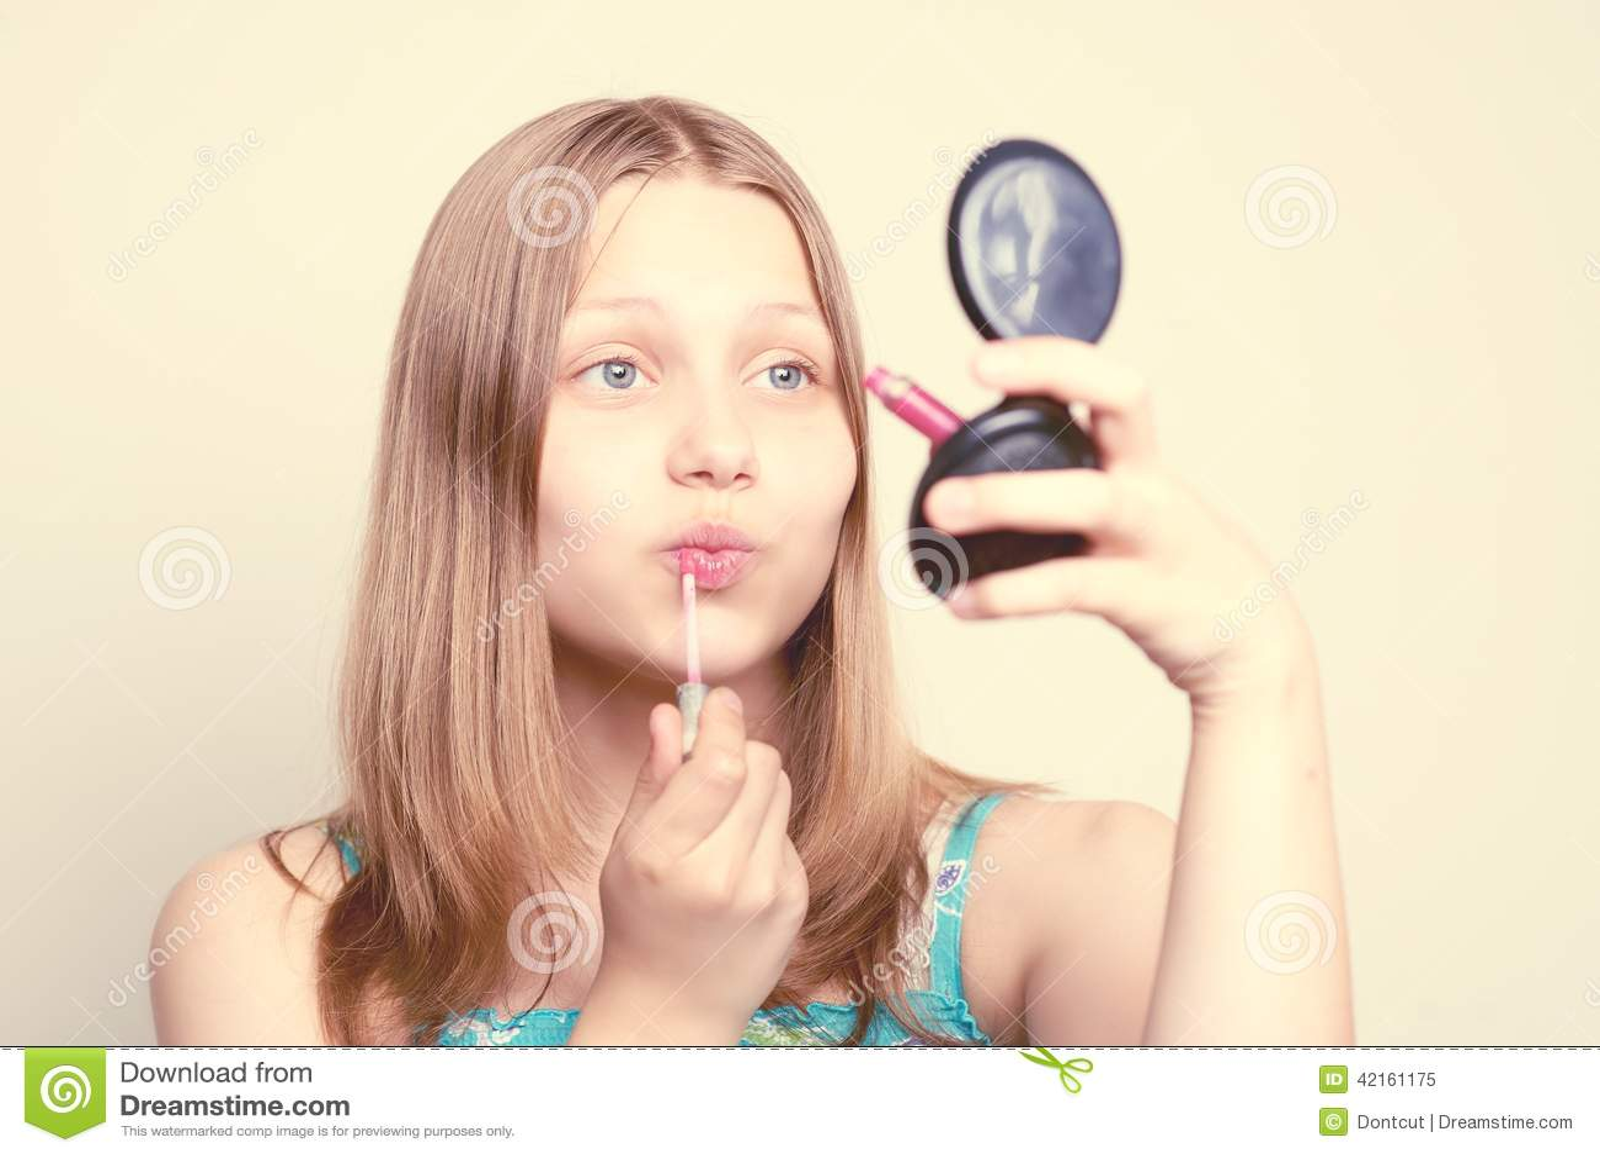 the happy mirror Information about happy mirror, maida vale, wa jaime kate makeup artistry & beauty rouge hair studio, 431 kalamunda road, maida vale, perth.